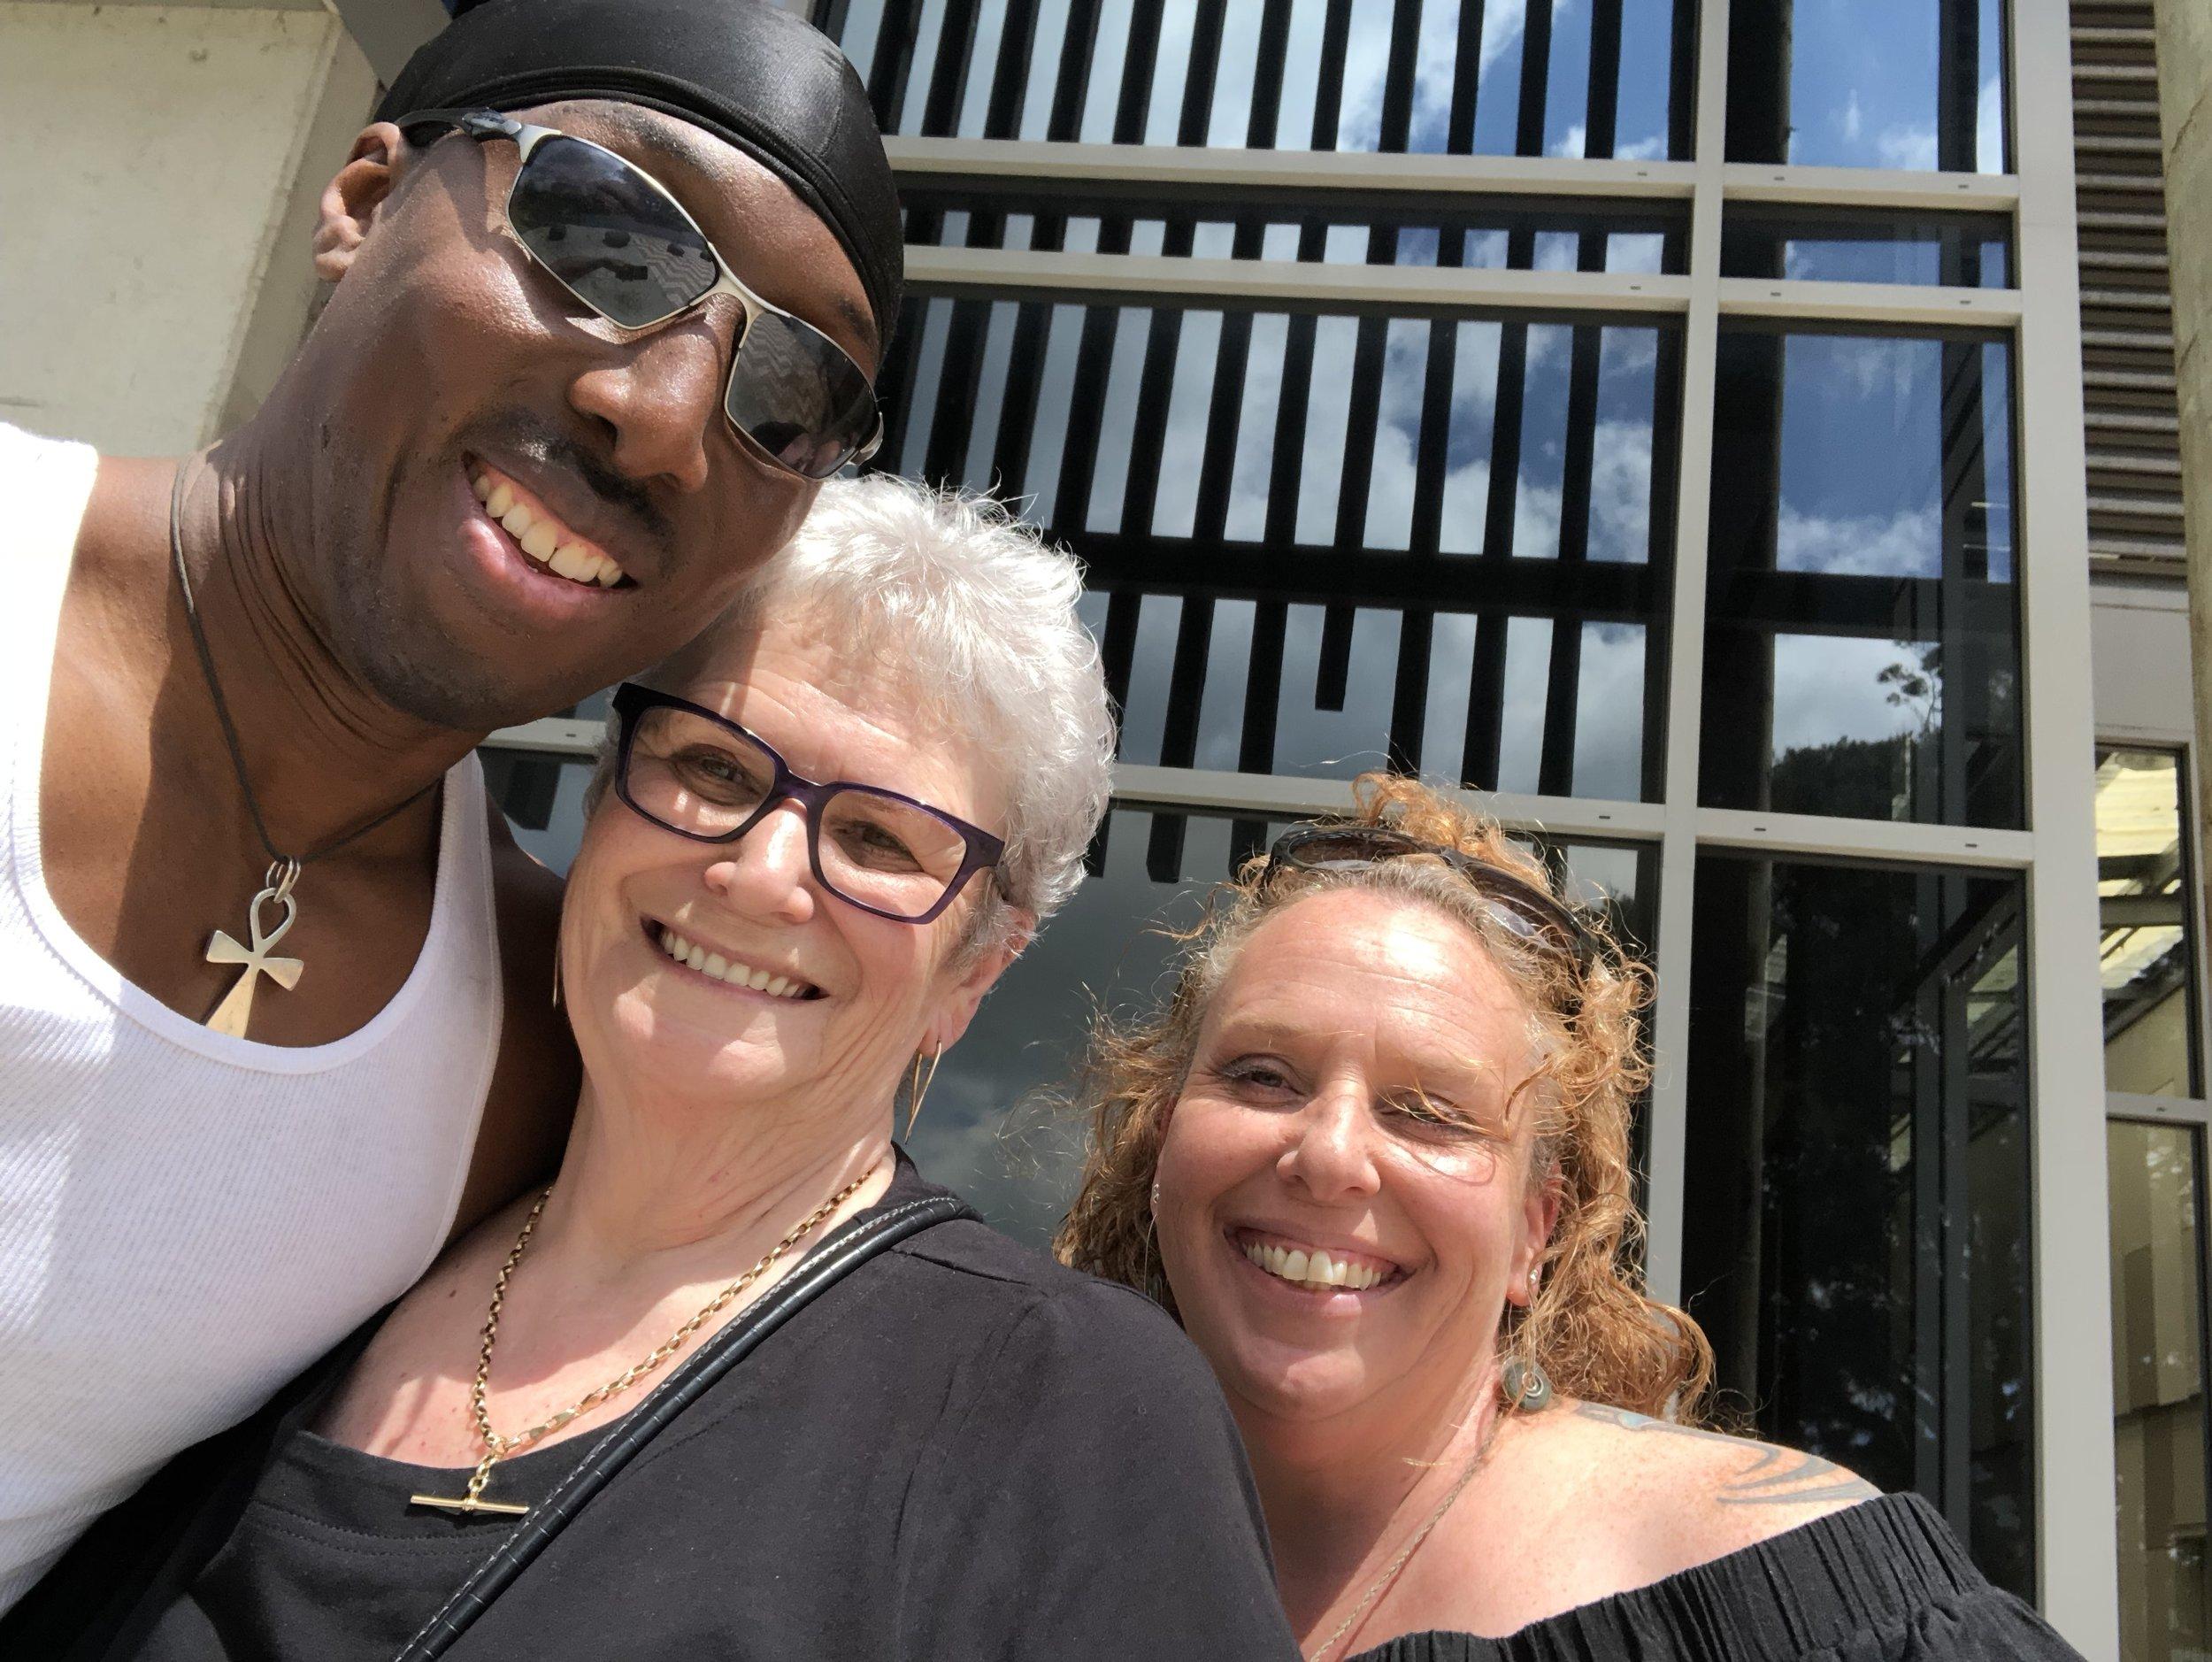 With Dr Antwi Akom and Haley Milne (Principal) at  Kia Aroha College